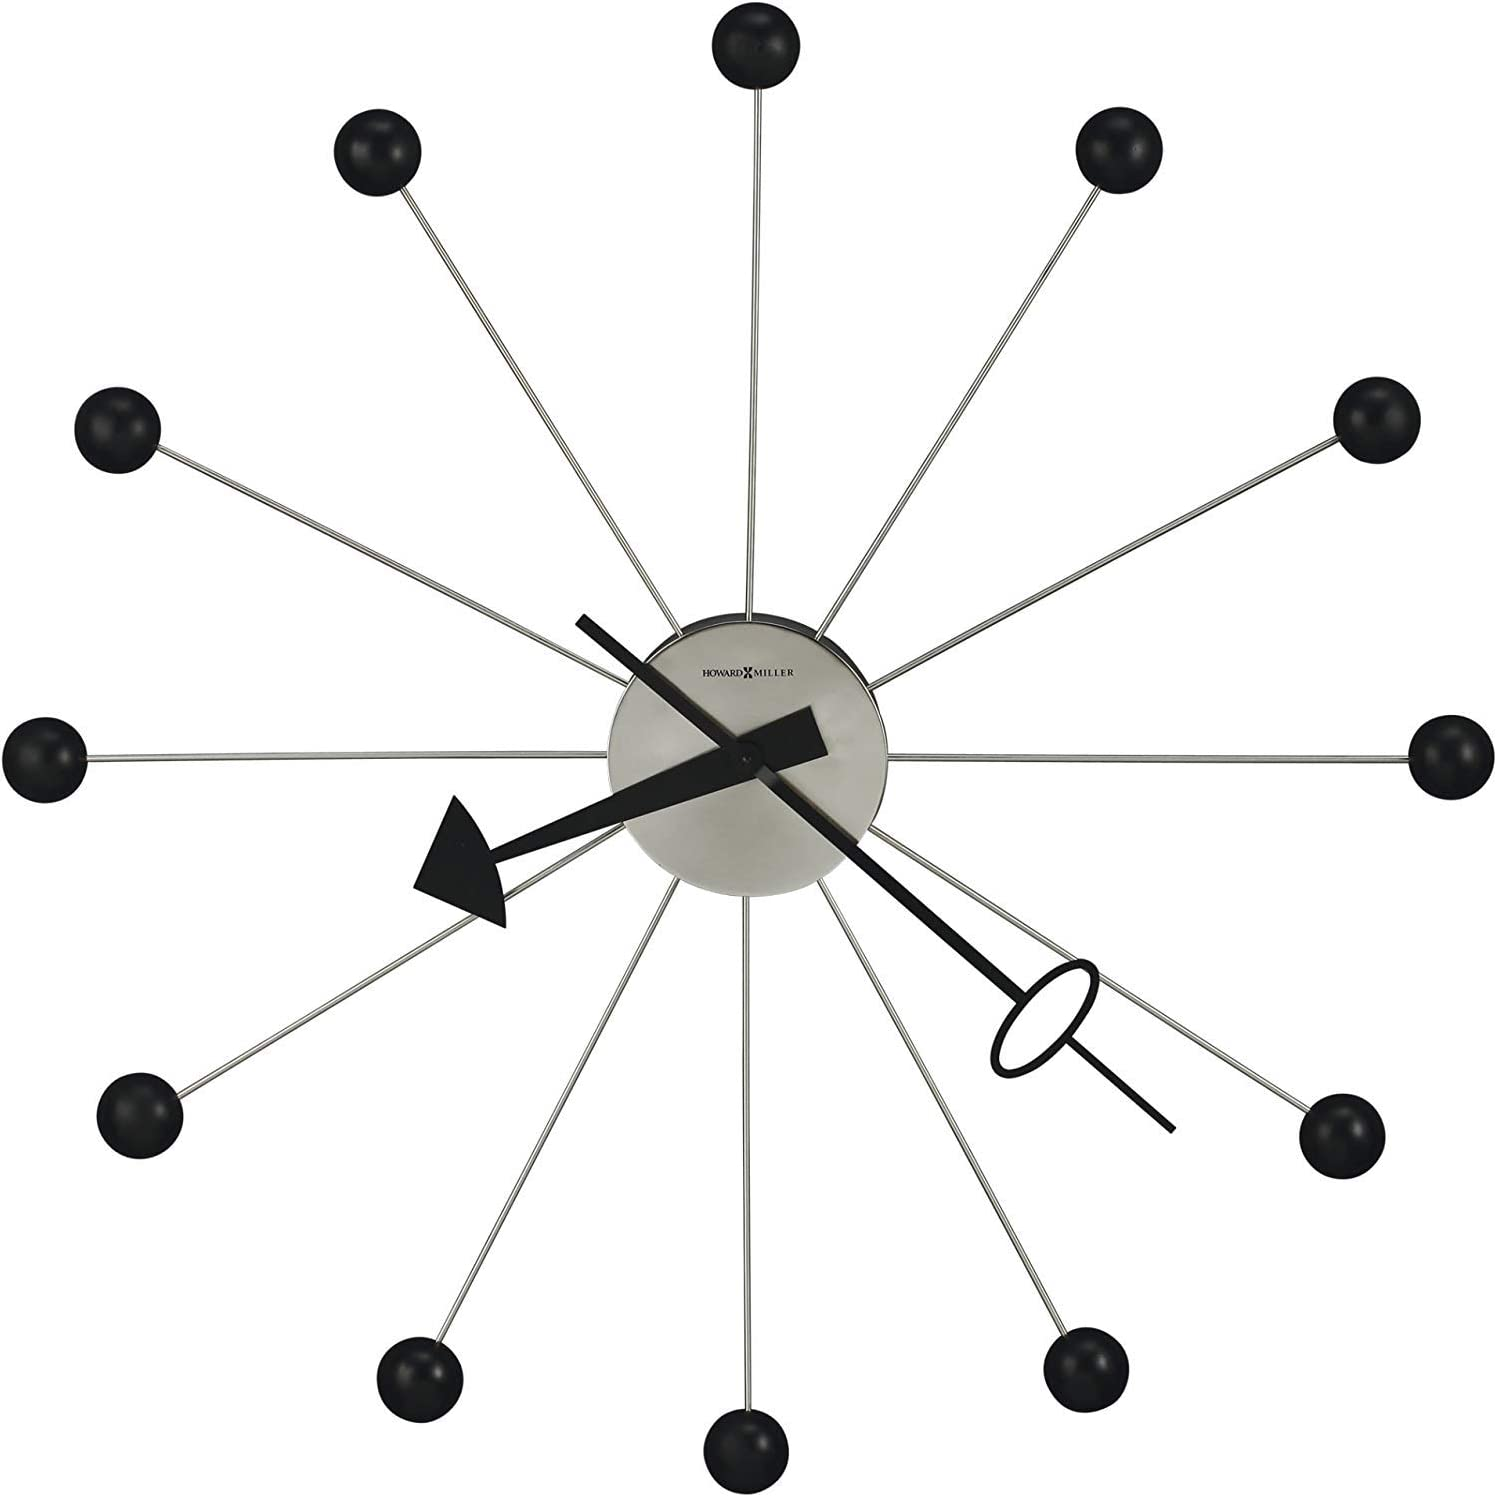 Howard Miller Ball Wall Clock II 625-527 – Oversized Retro Classic with Quartz Movement